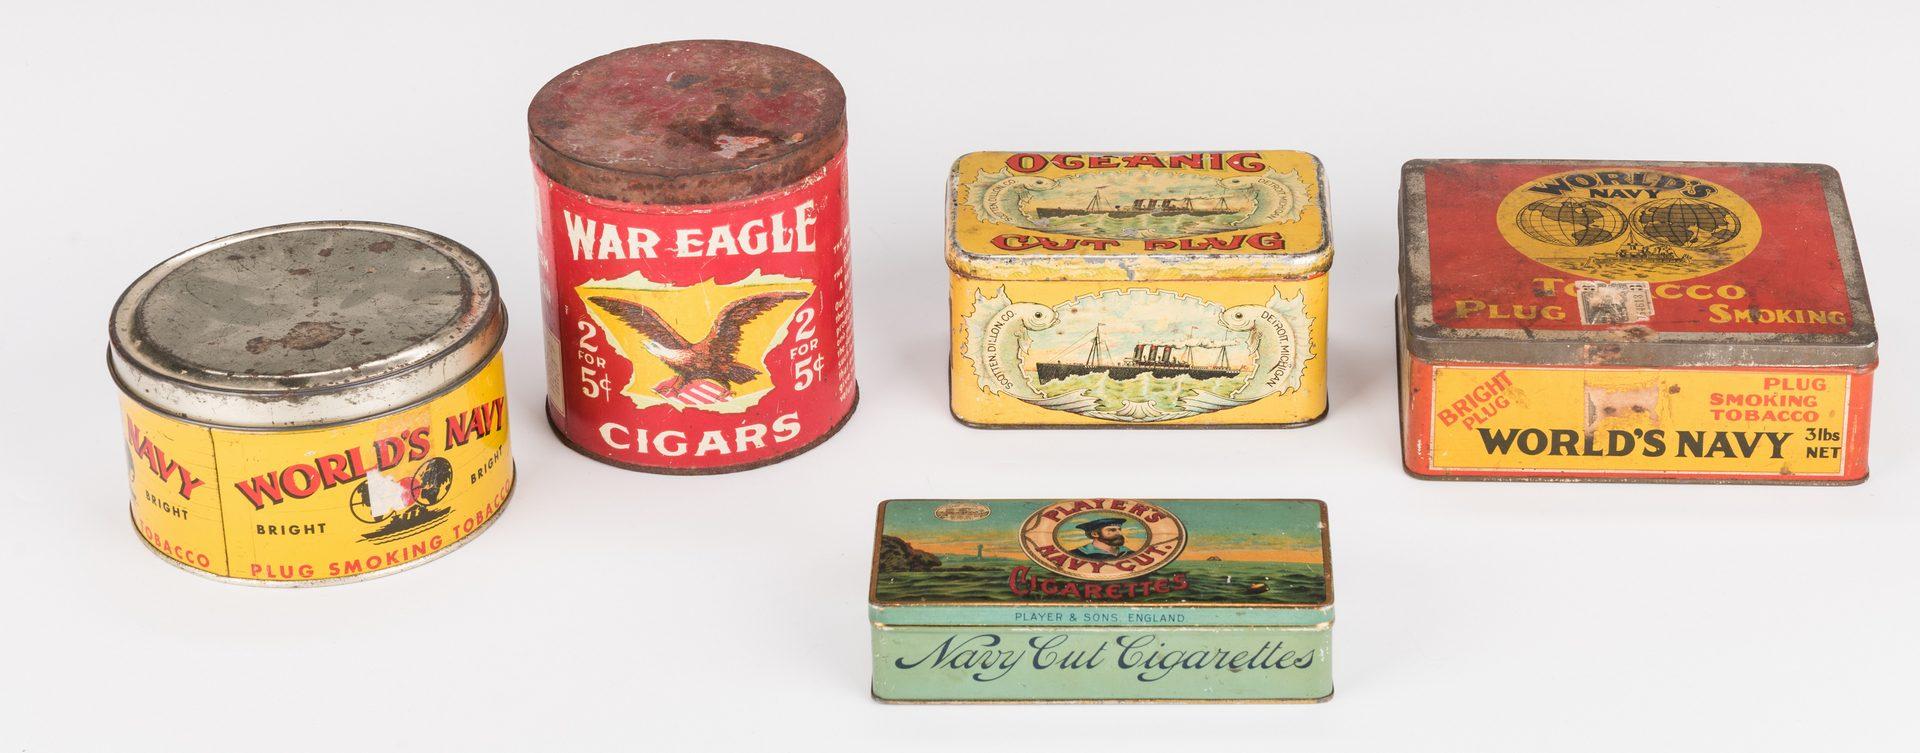 Lot 240: 17 Advertising Tobacco Tins